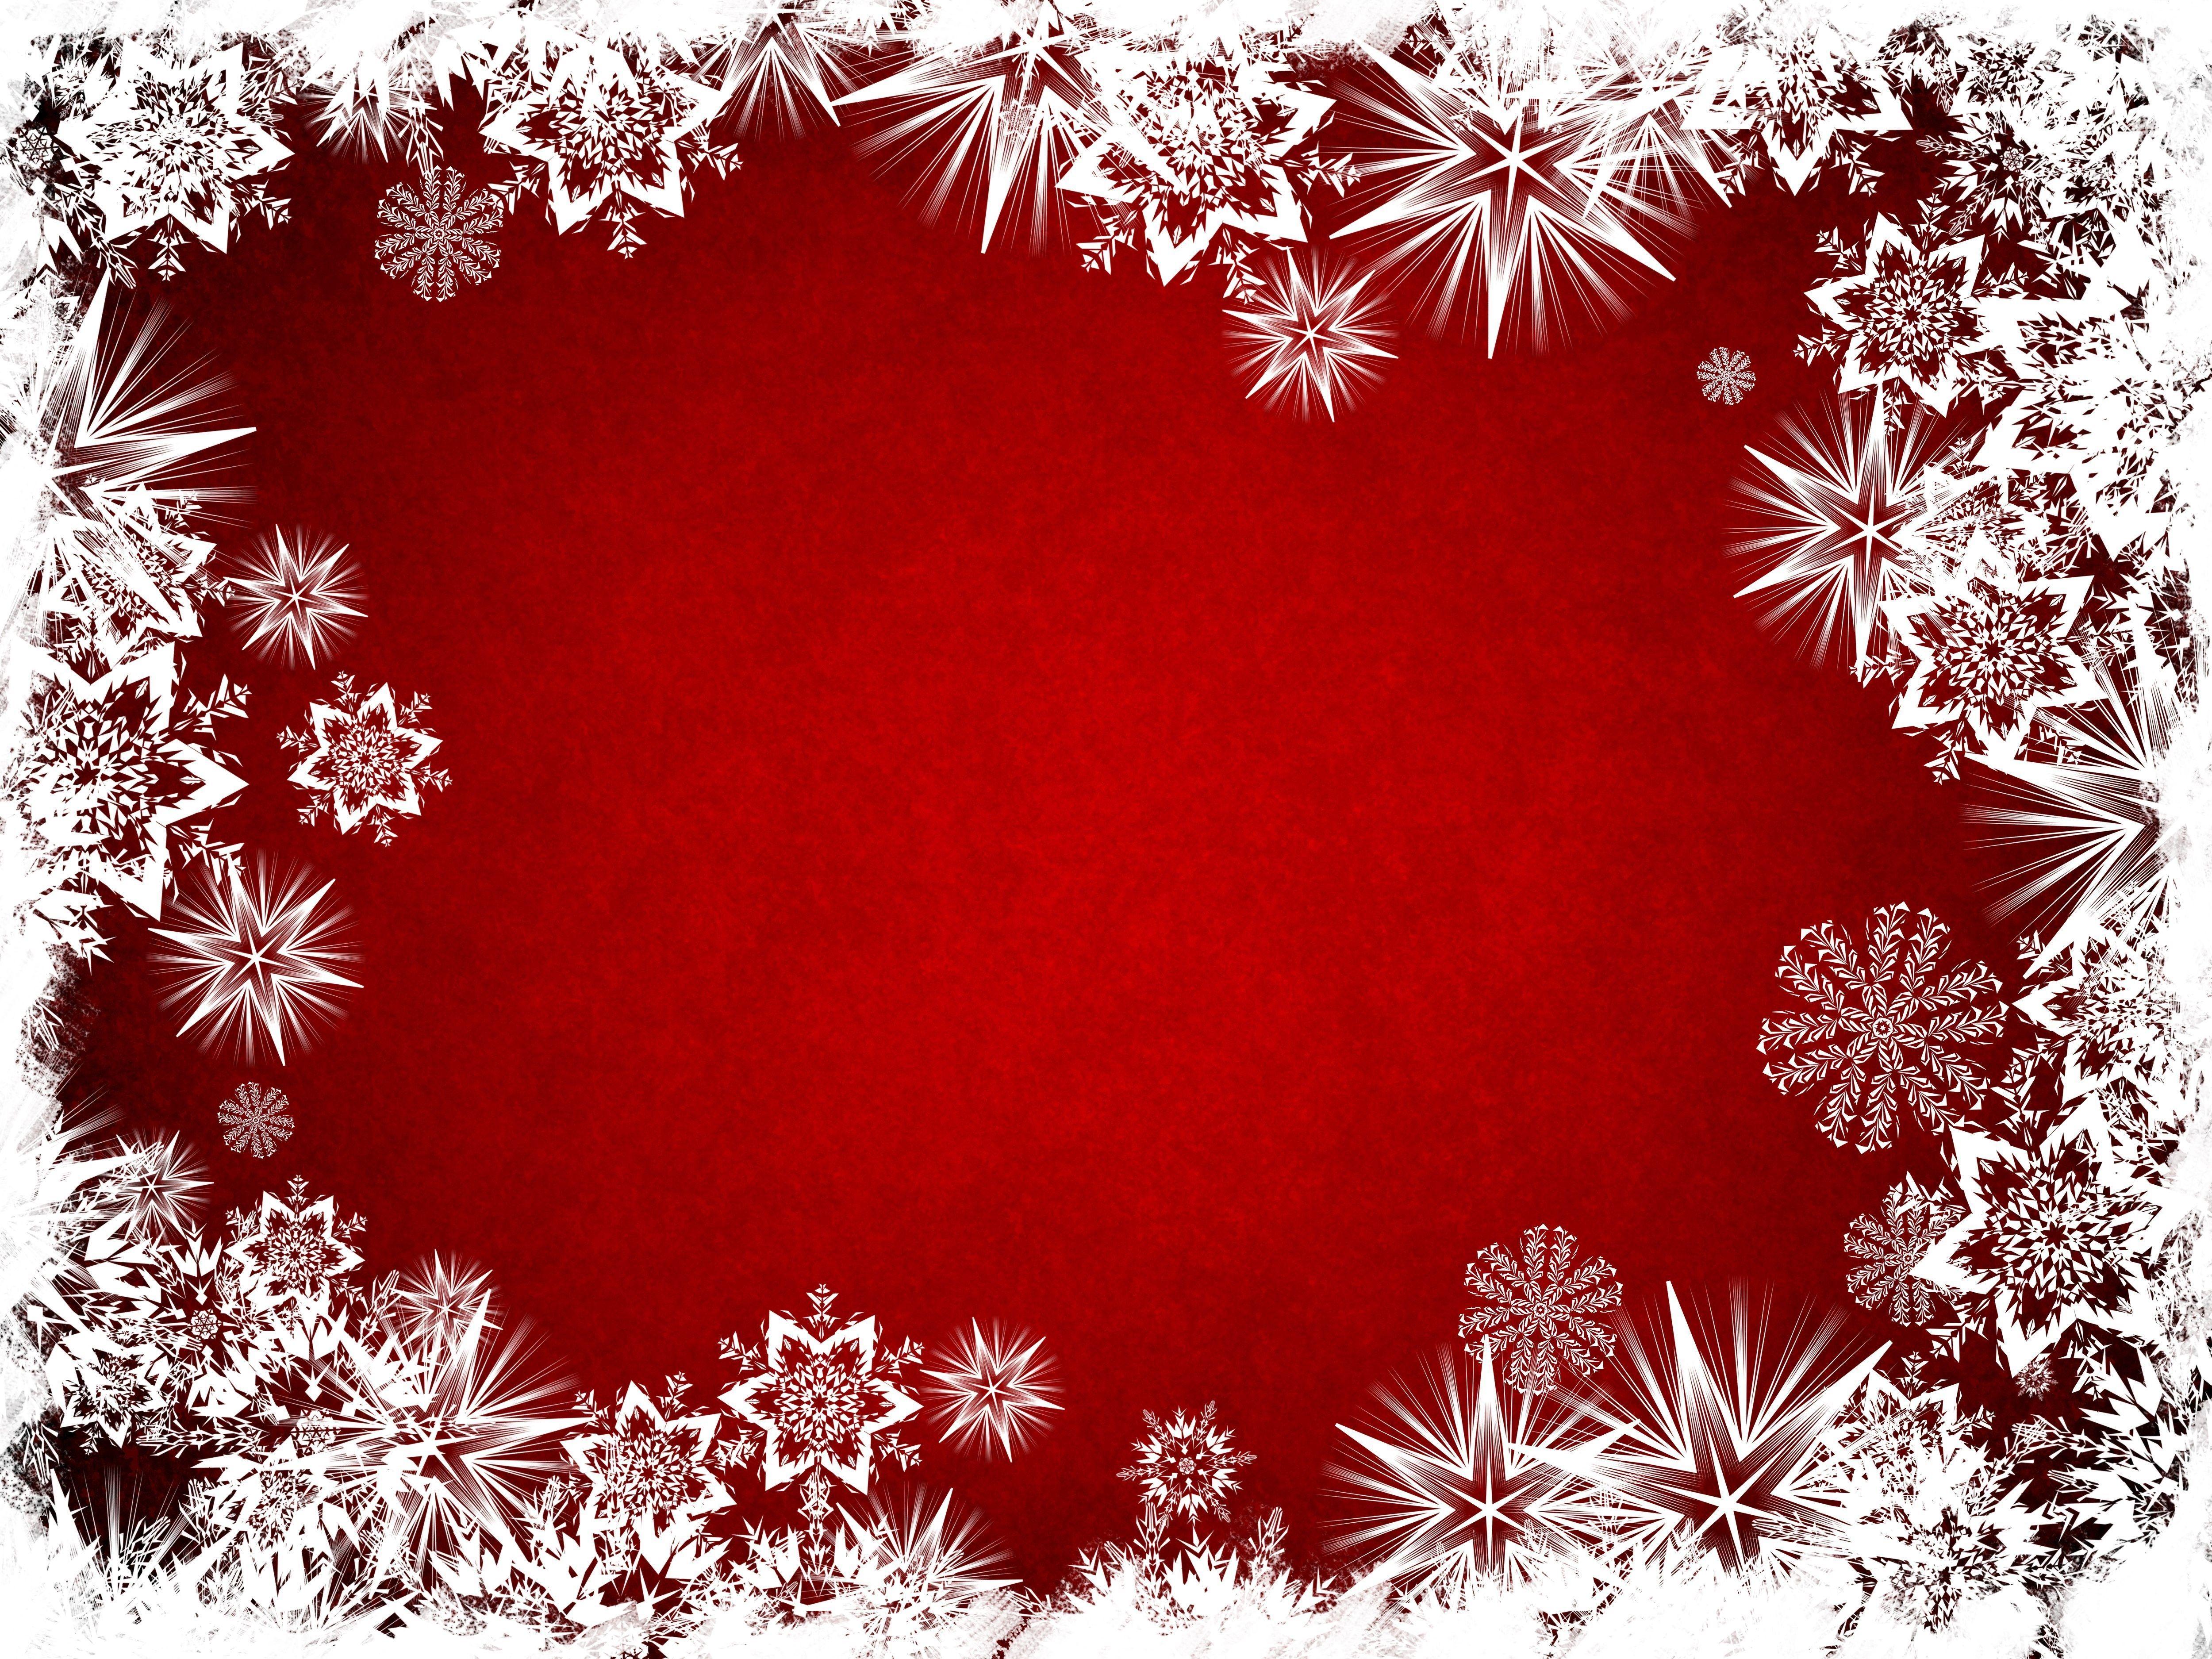 snowflake - full hd background 5000x3750 | hueputalo | pinterest